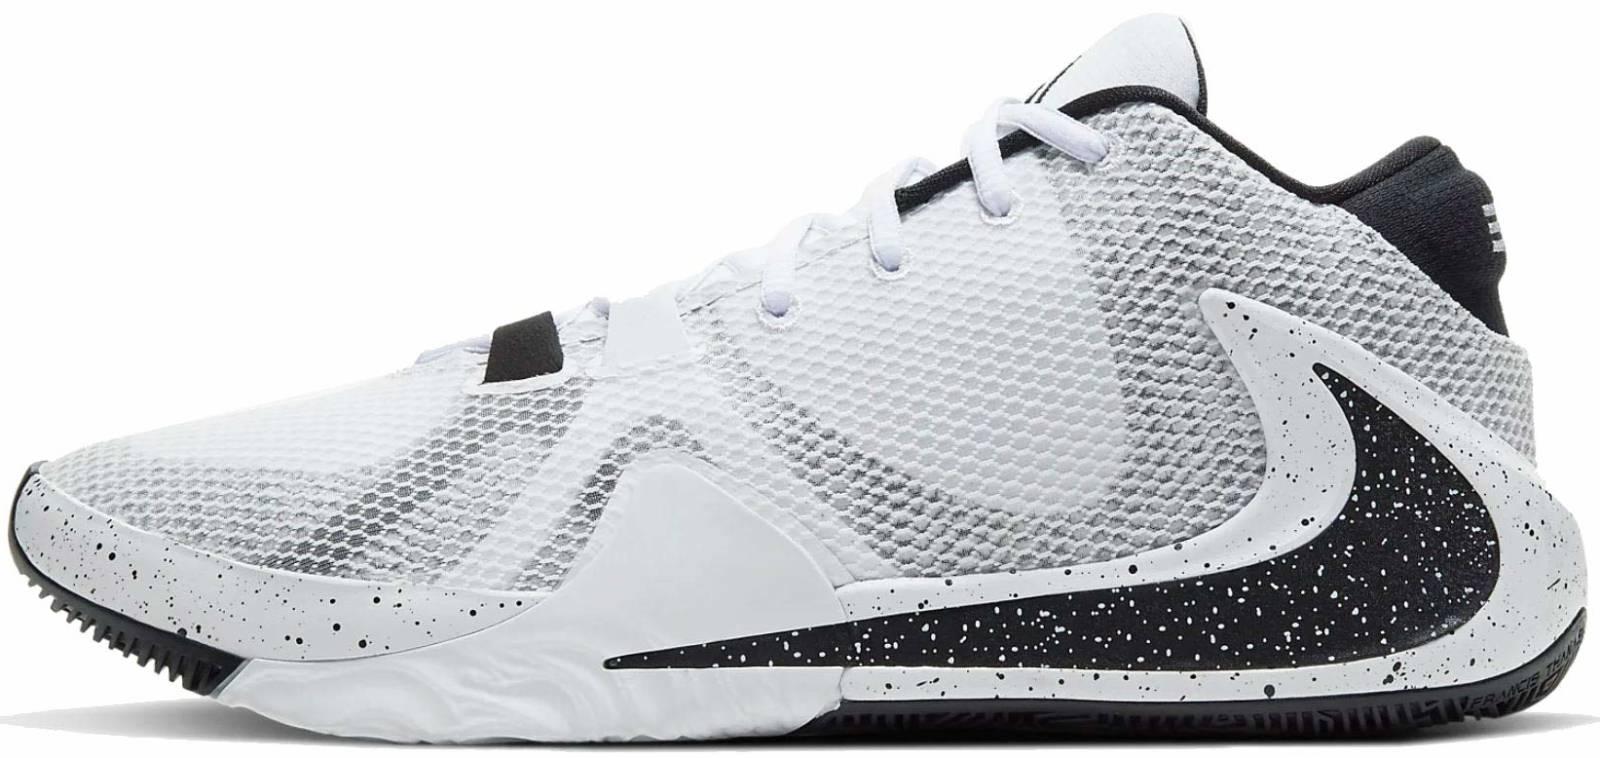 germen gloria Seis  Save 35% on White Nike Basketball Shoes (65 Models in Stock) | RunRepeat